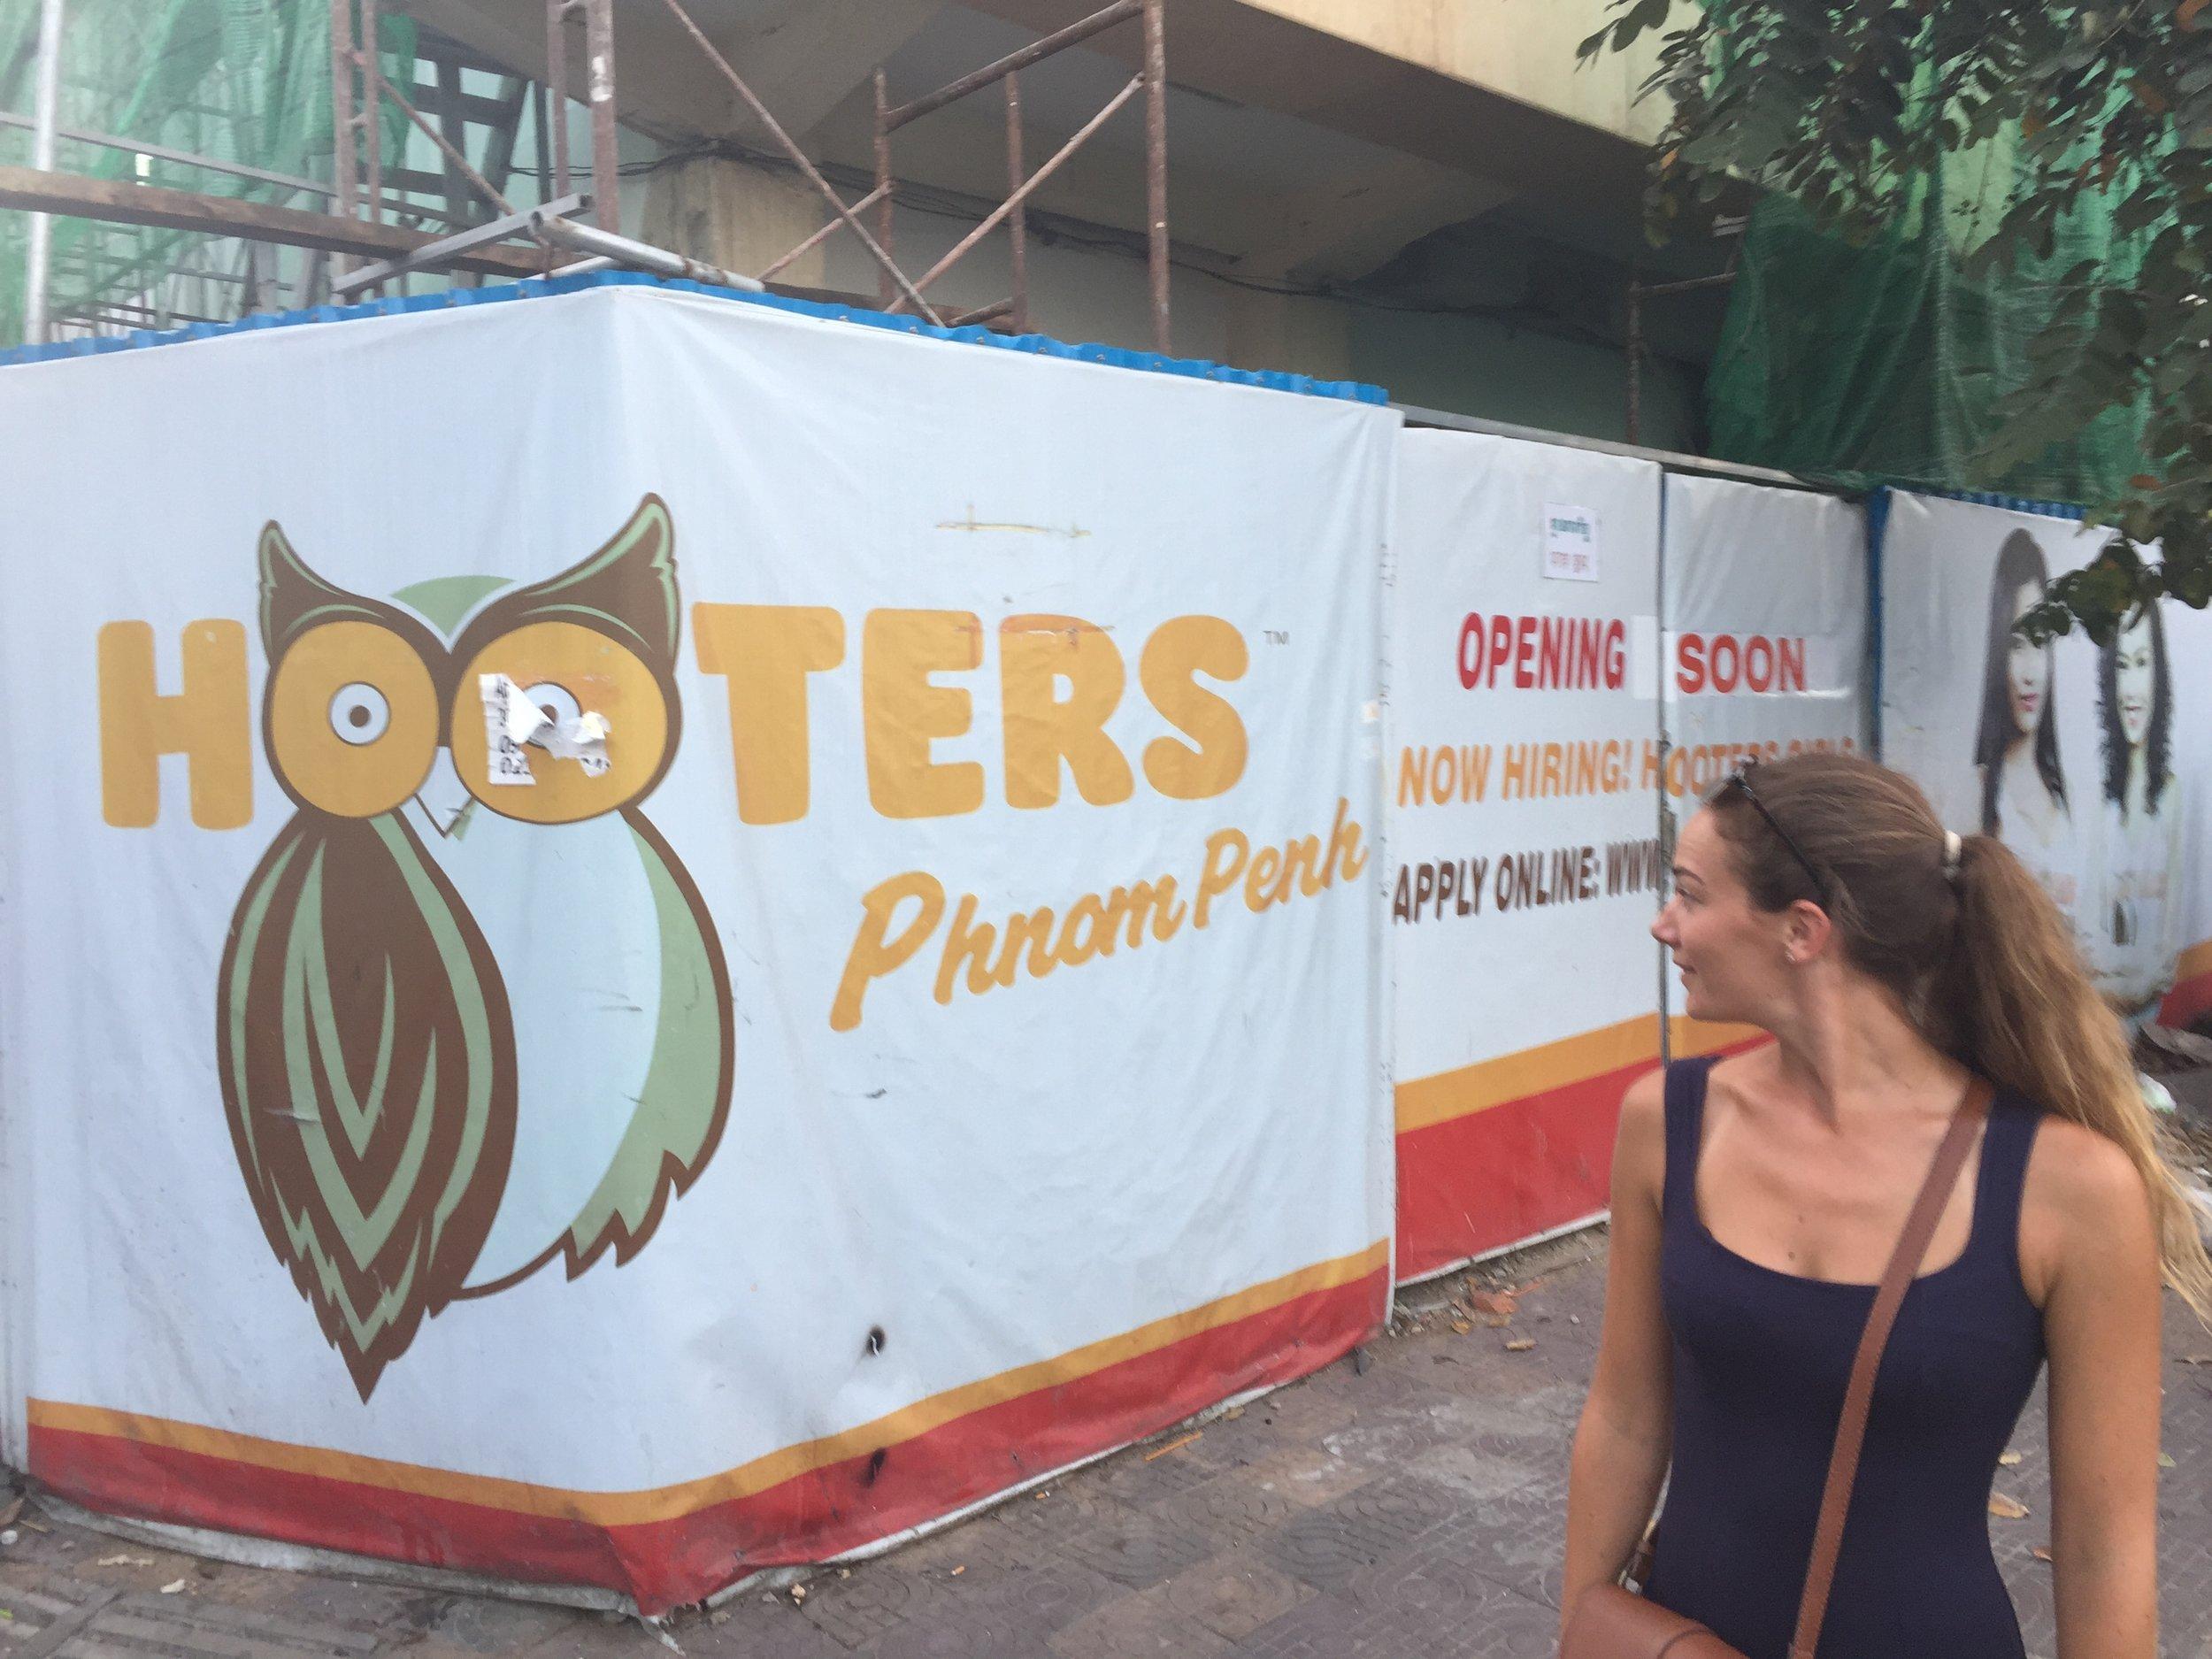 Fine establishments coming soon to Phnom Penh!